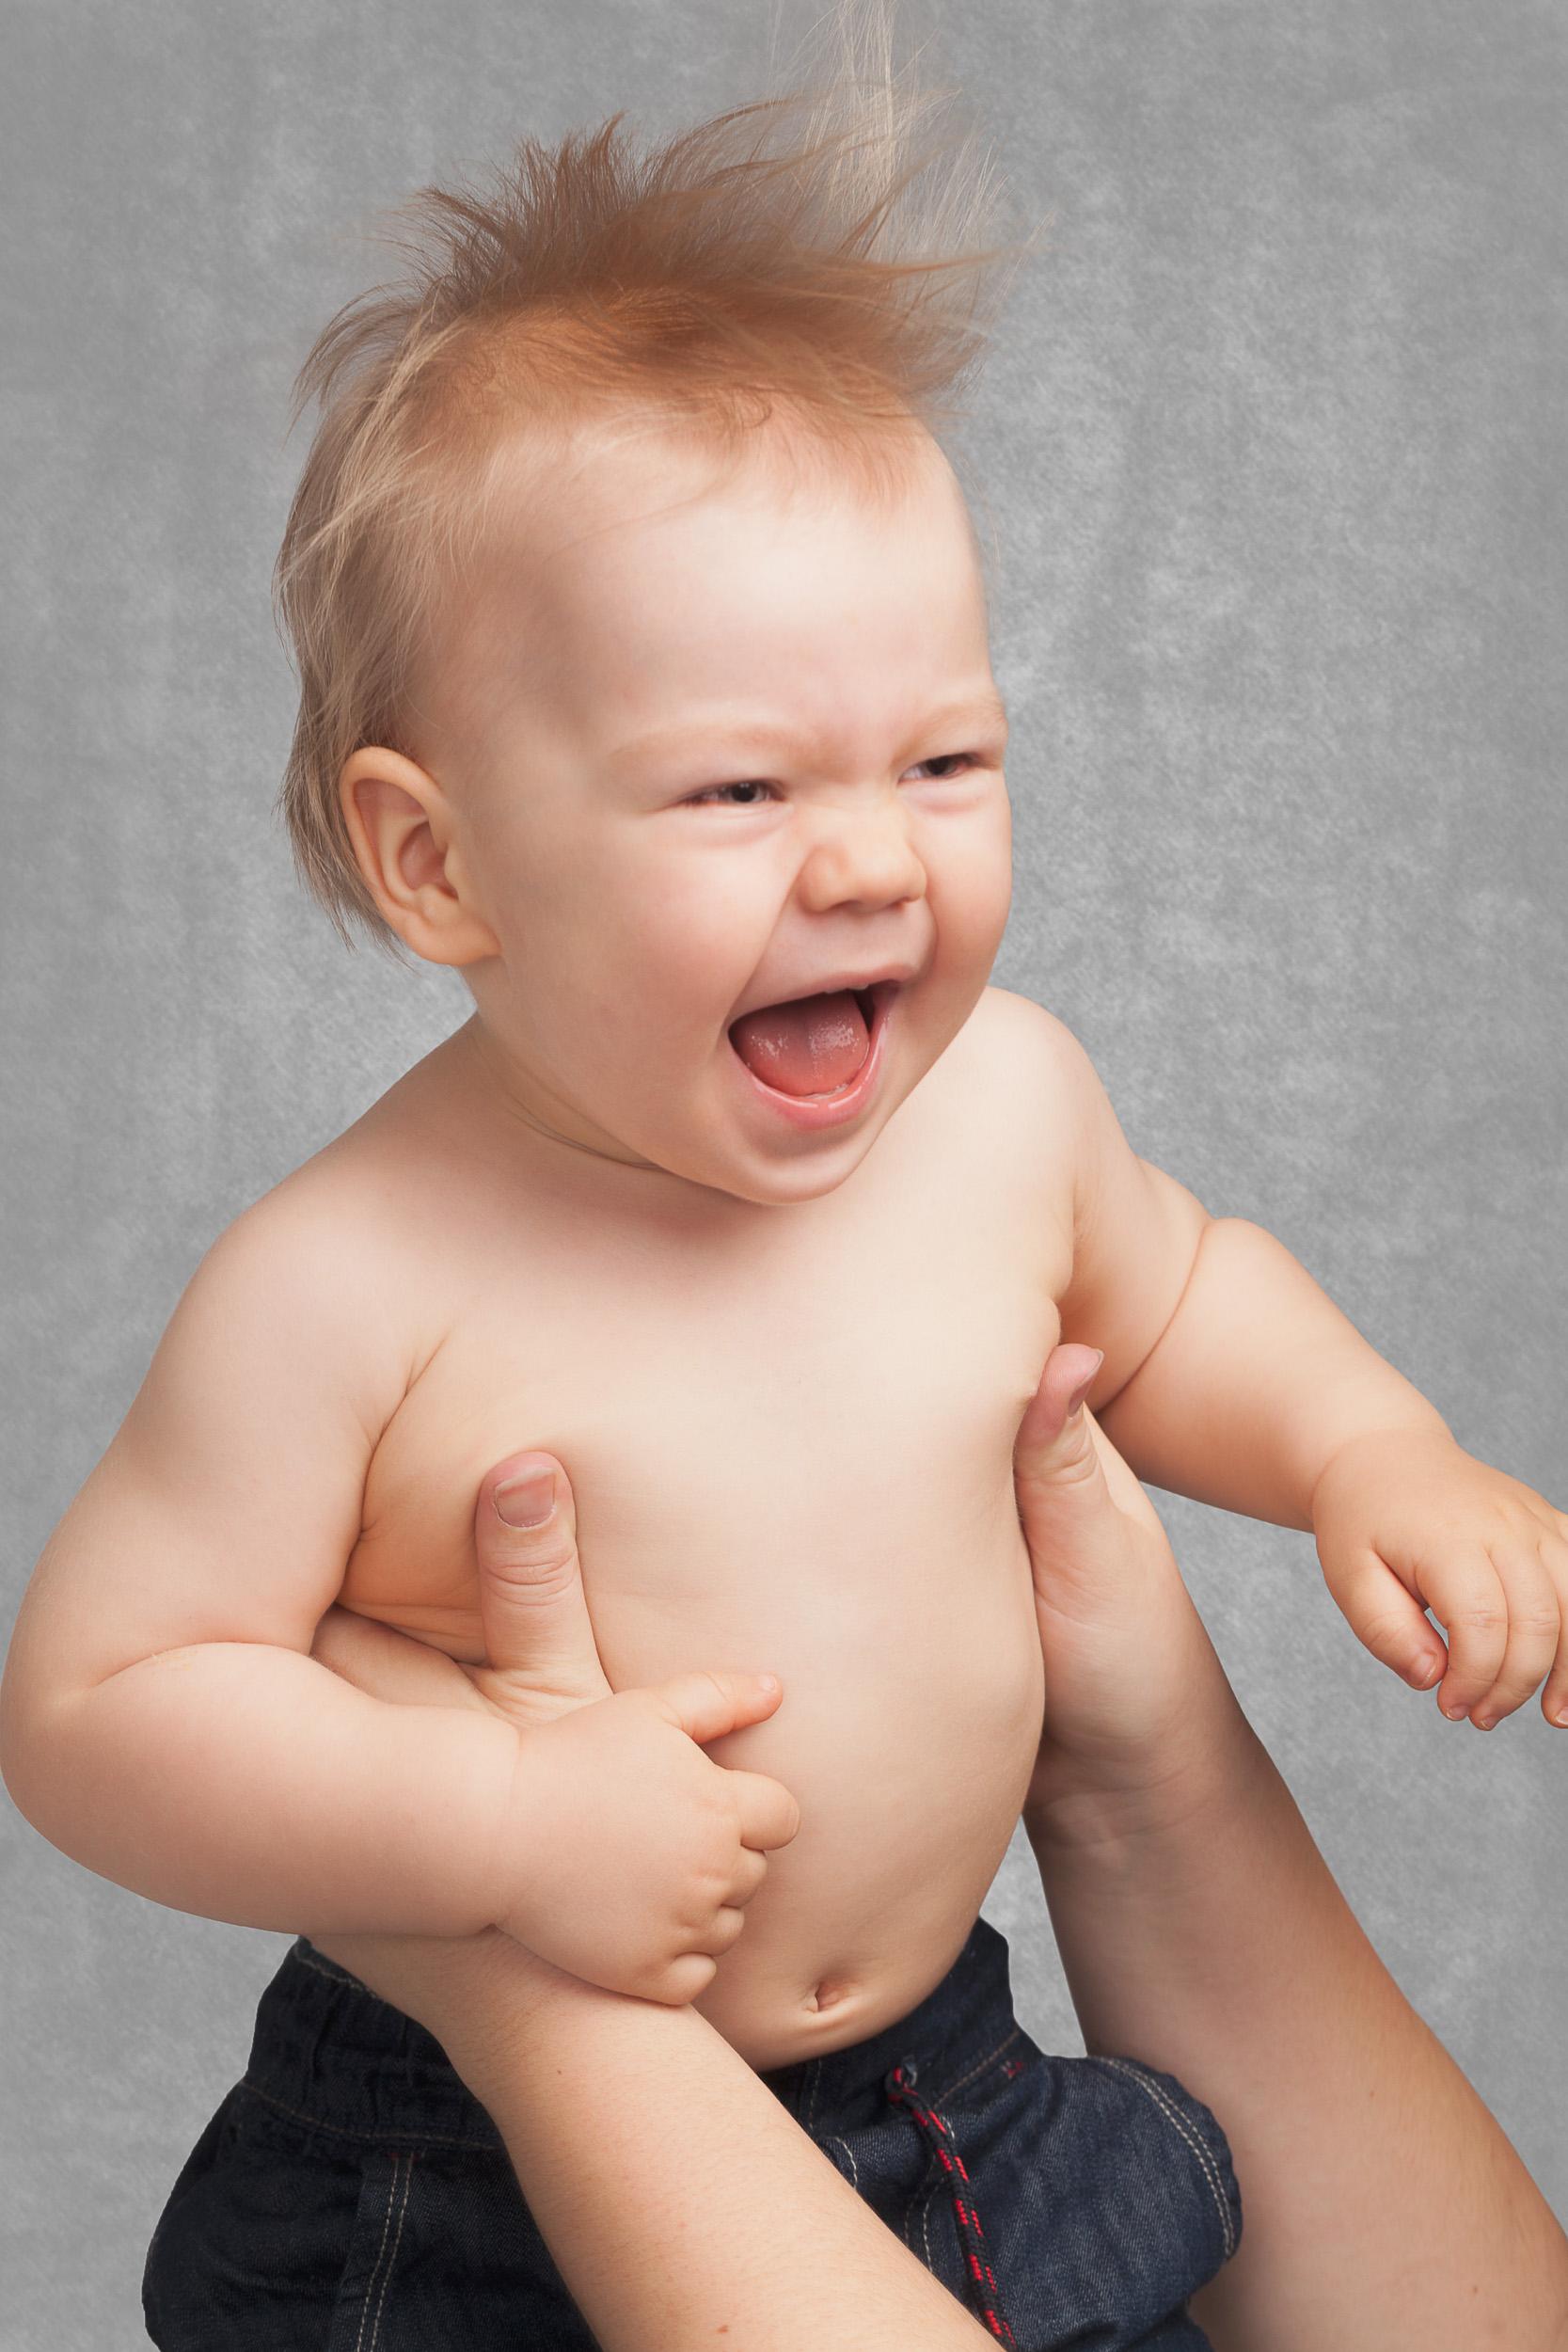 Perhekuvaus-lapsikuvaus-vauvakuvaus-raskaus-valokuvaaja-helsinki-alejandro lorenzo-003.jpg